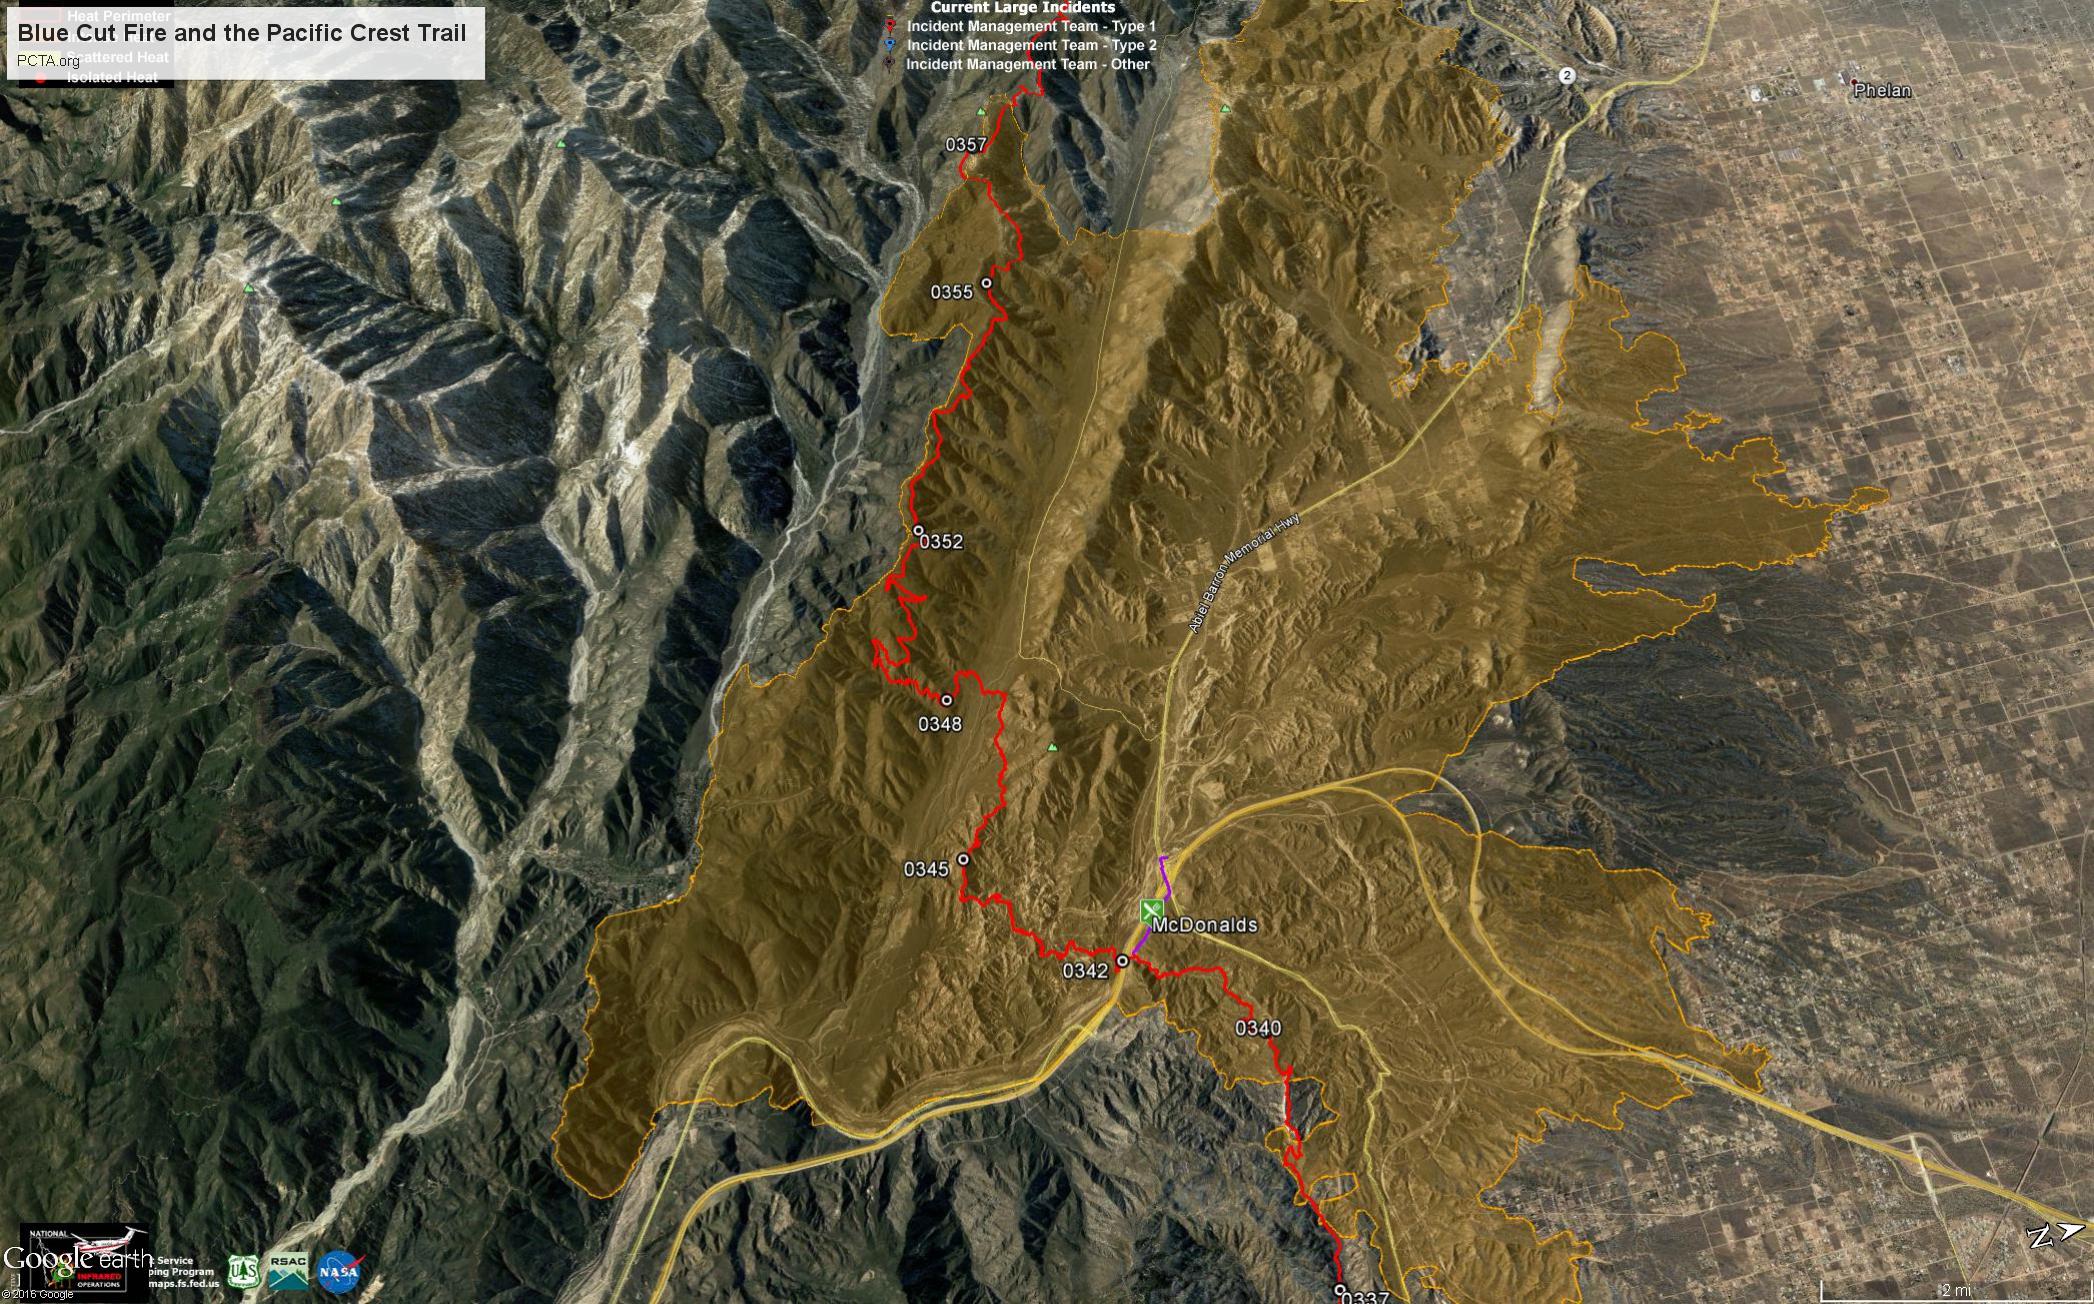 Cajon Pass Fire Map.Blue Cut Fire In Cajon Pass Pacific Crest Trail Association